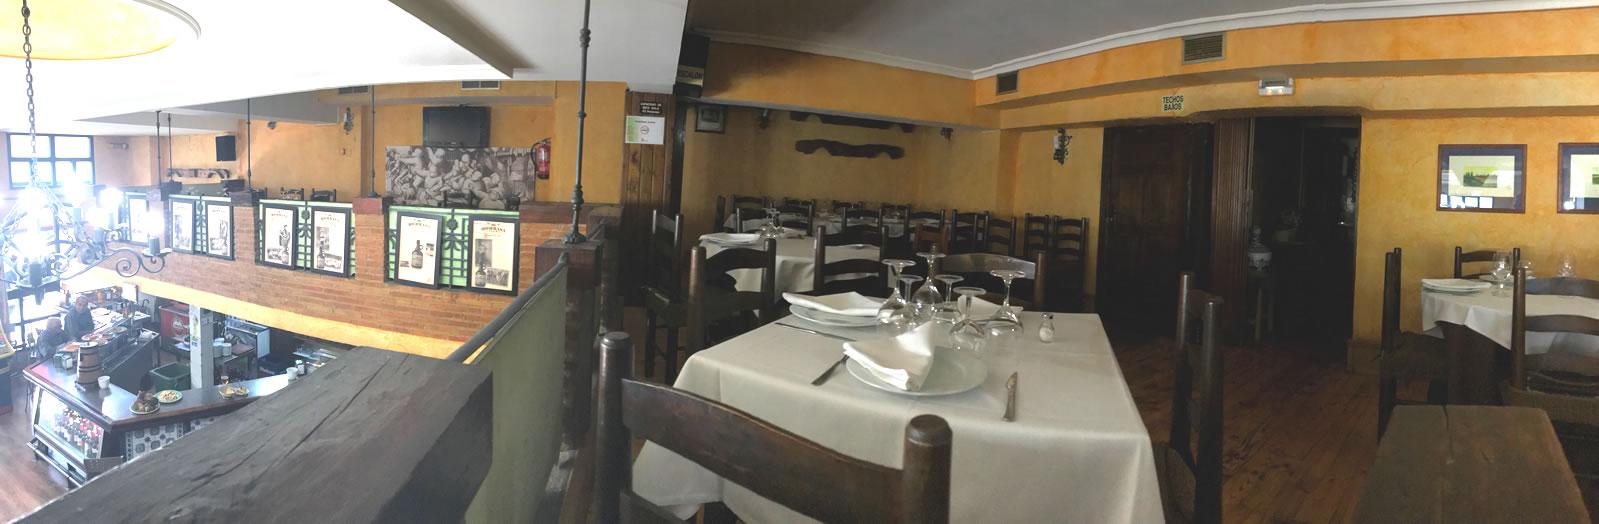 Restaurante Casa Garrido: Vista 2ª planta del Restaurante Casa Garrido (Soria)